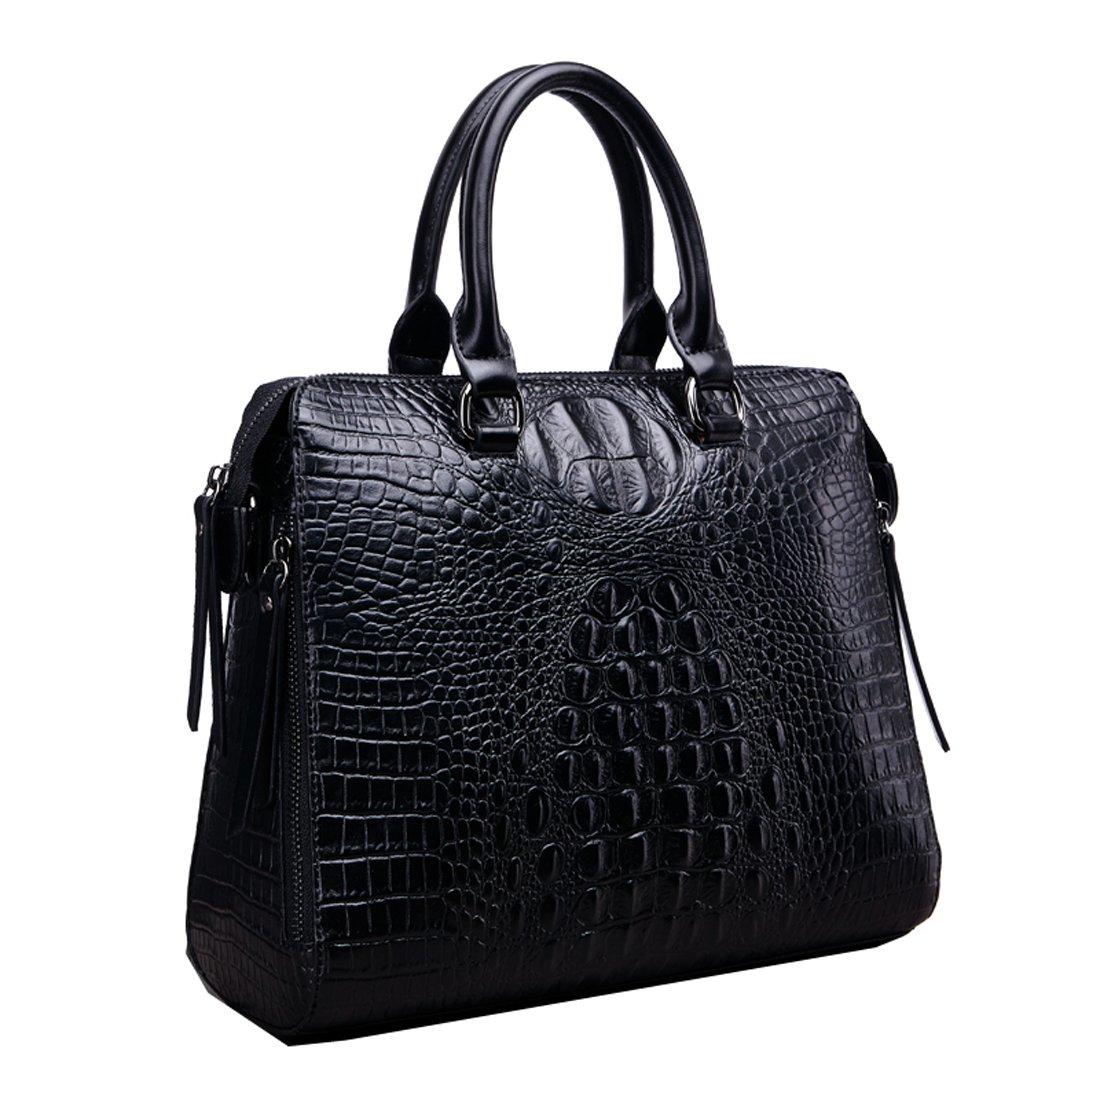 Black Shengdilu Women's Leather Purse Handbag Crocodile Satchel Tote Shoulder Bag Cowhide Vintage Work Crossbody